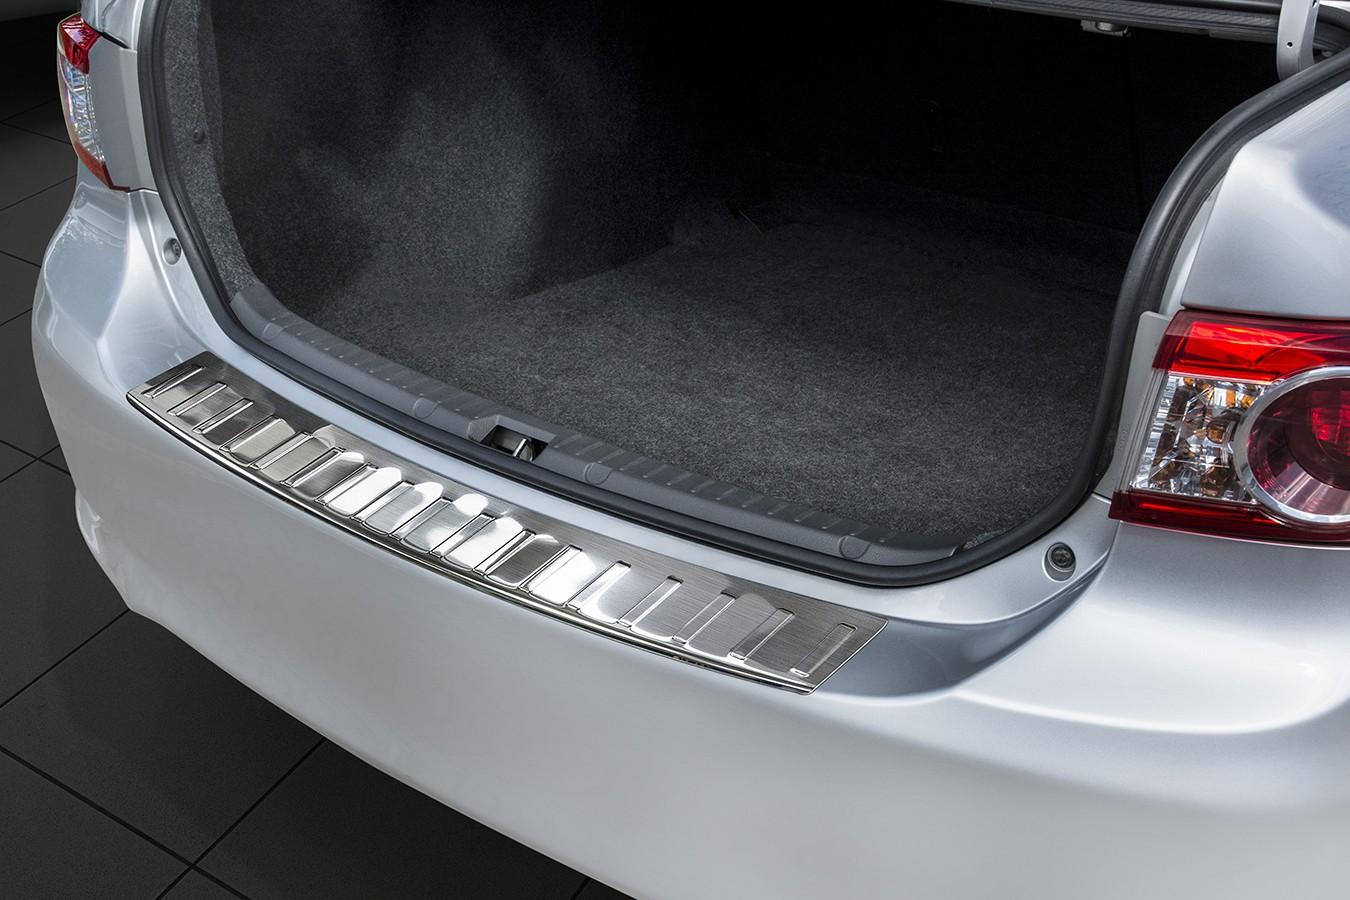 Toyota COROLLA X E-15 sedan (2010-2013)